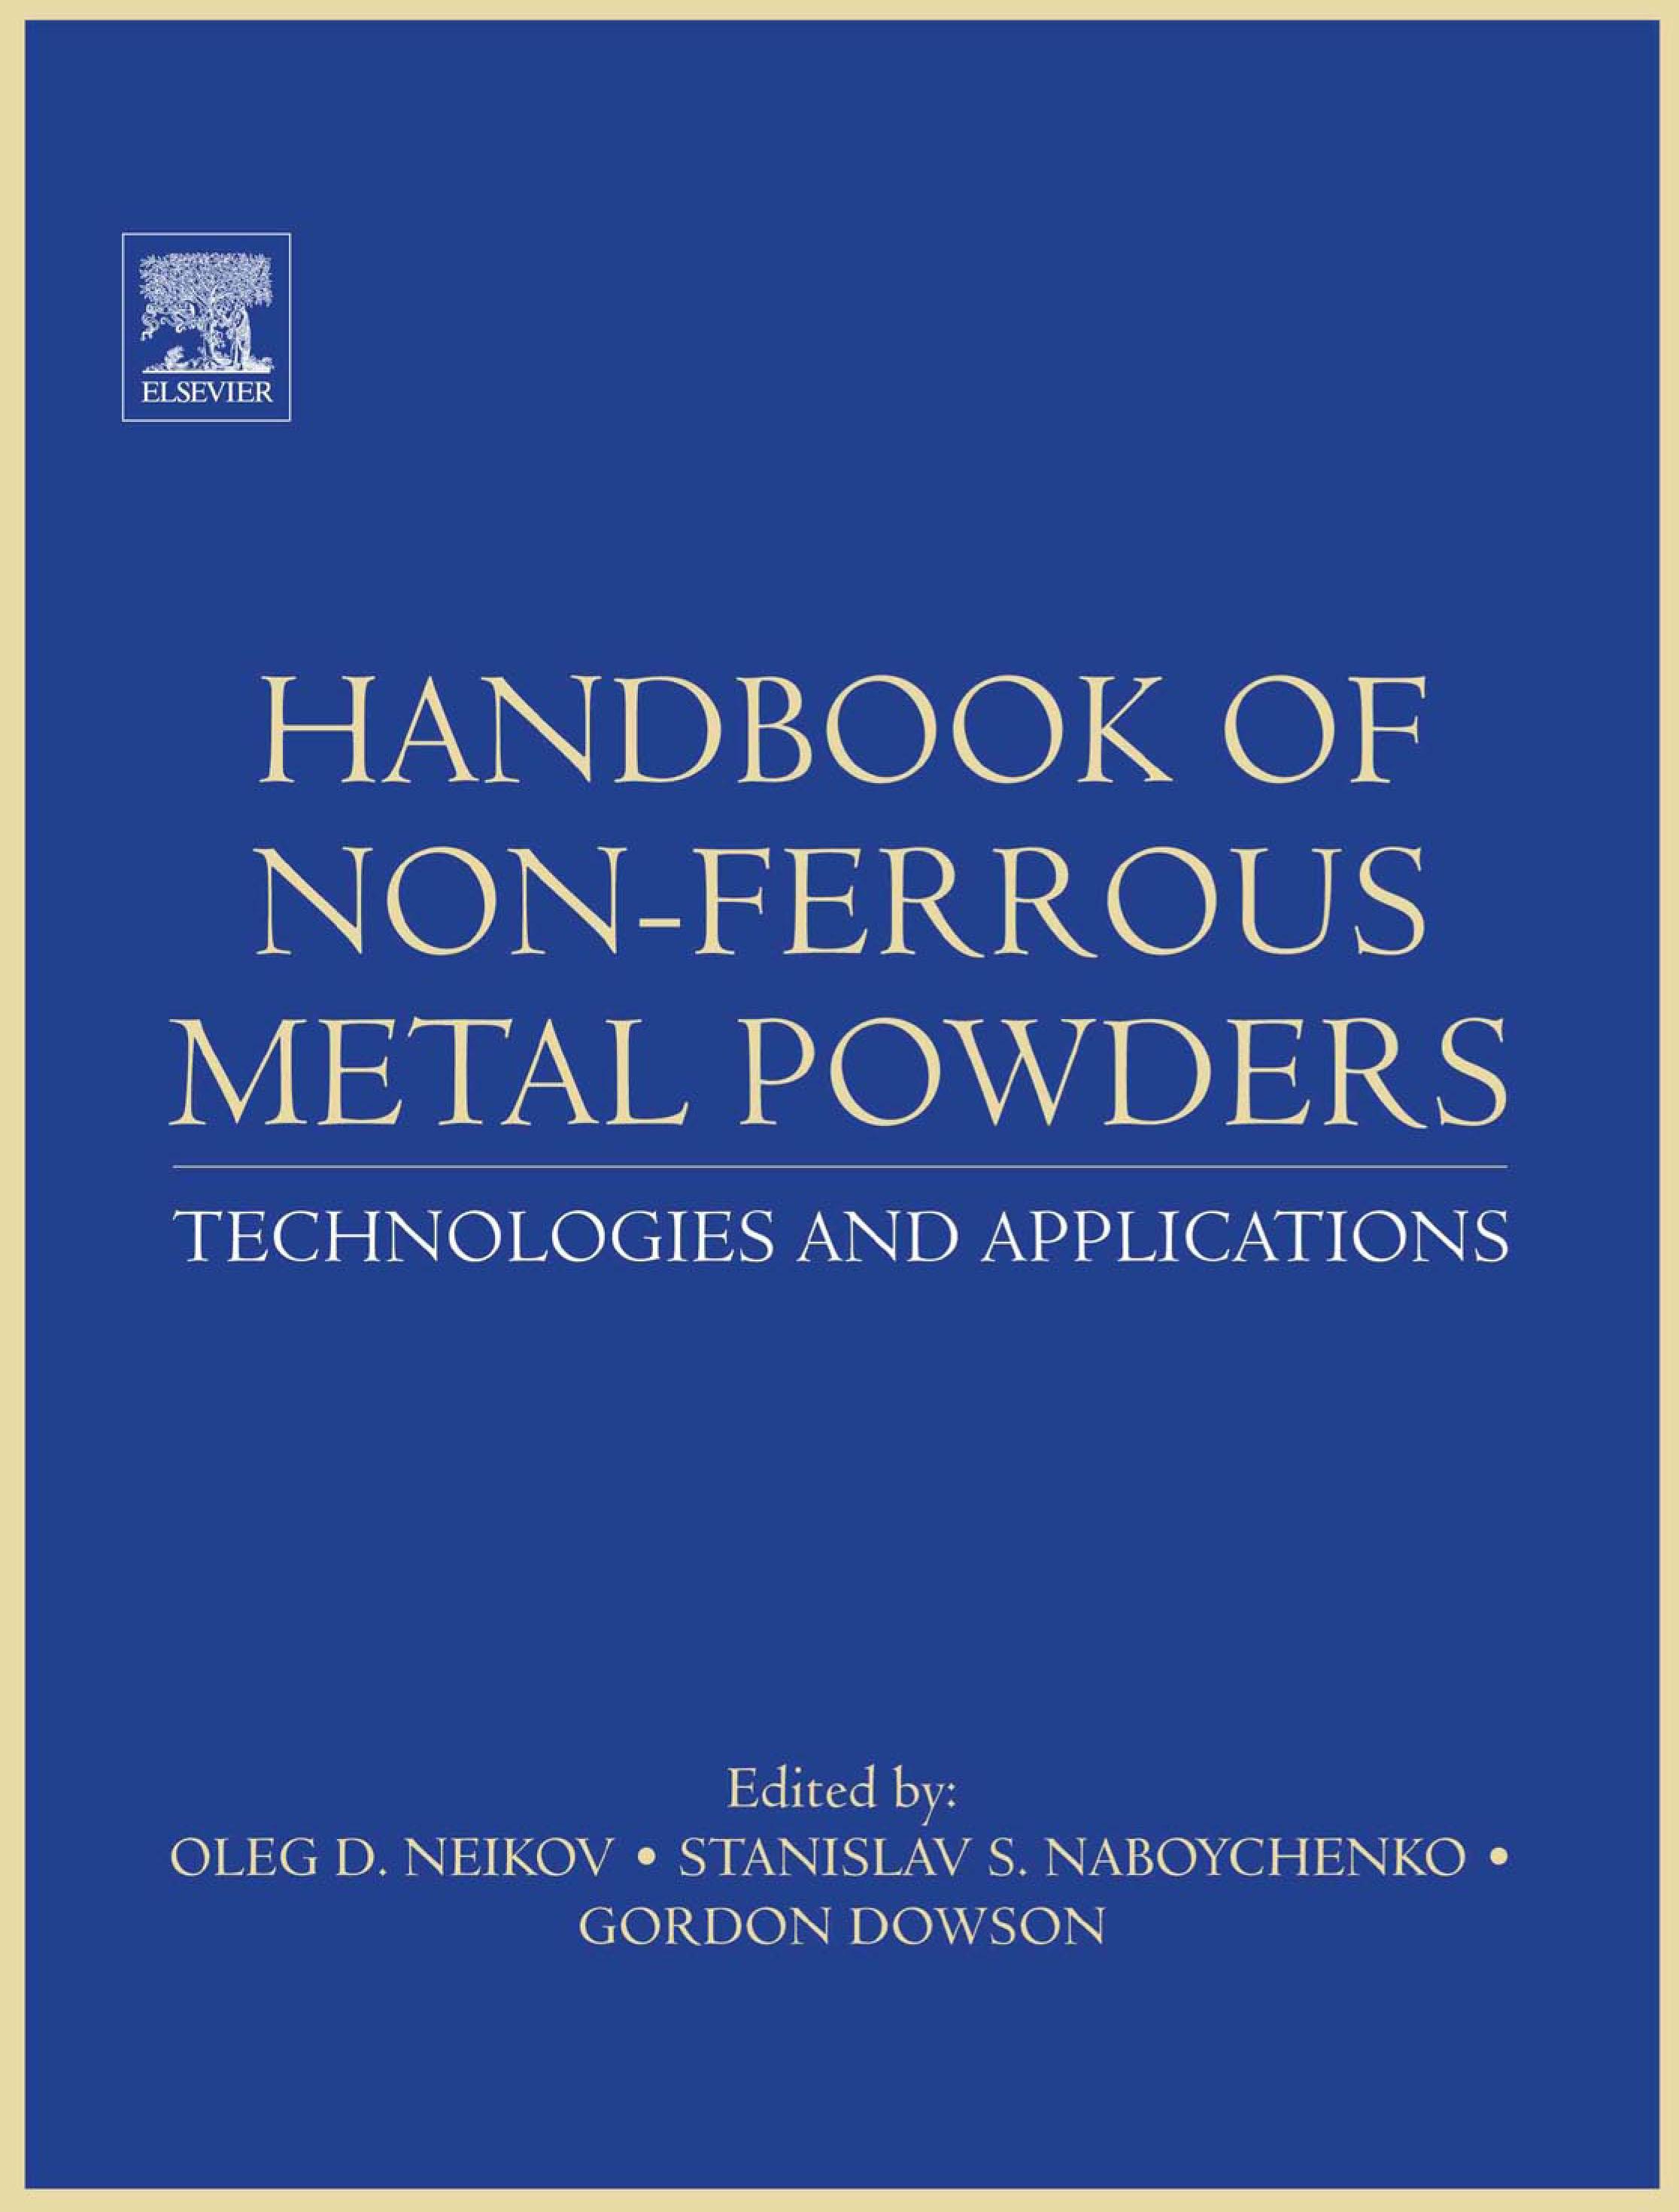 Handbook of Non-Ferrous Metal Powders: Technologies and Applications EB9780080559407